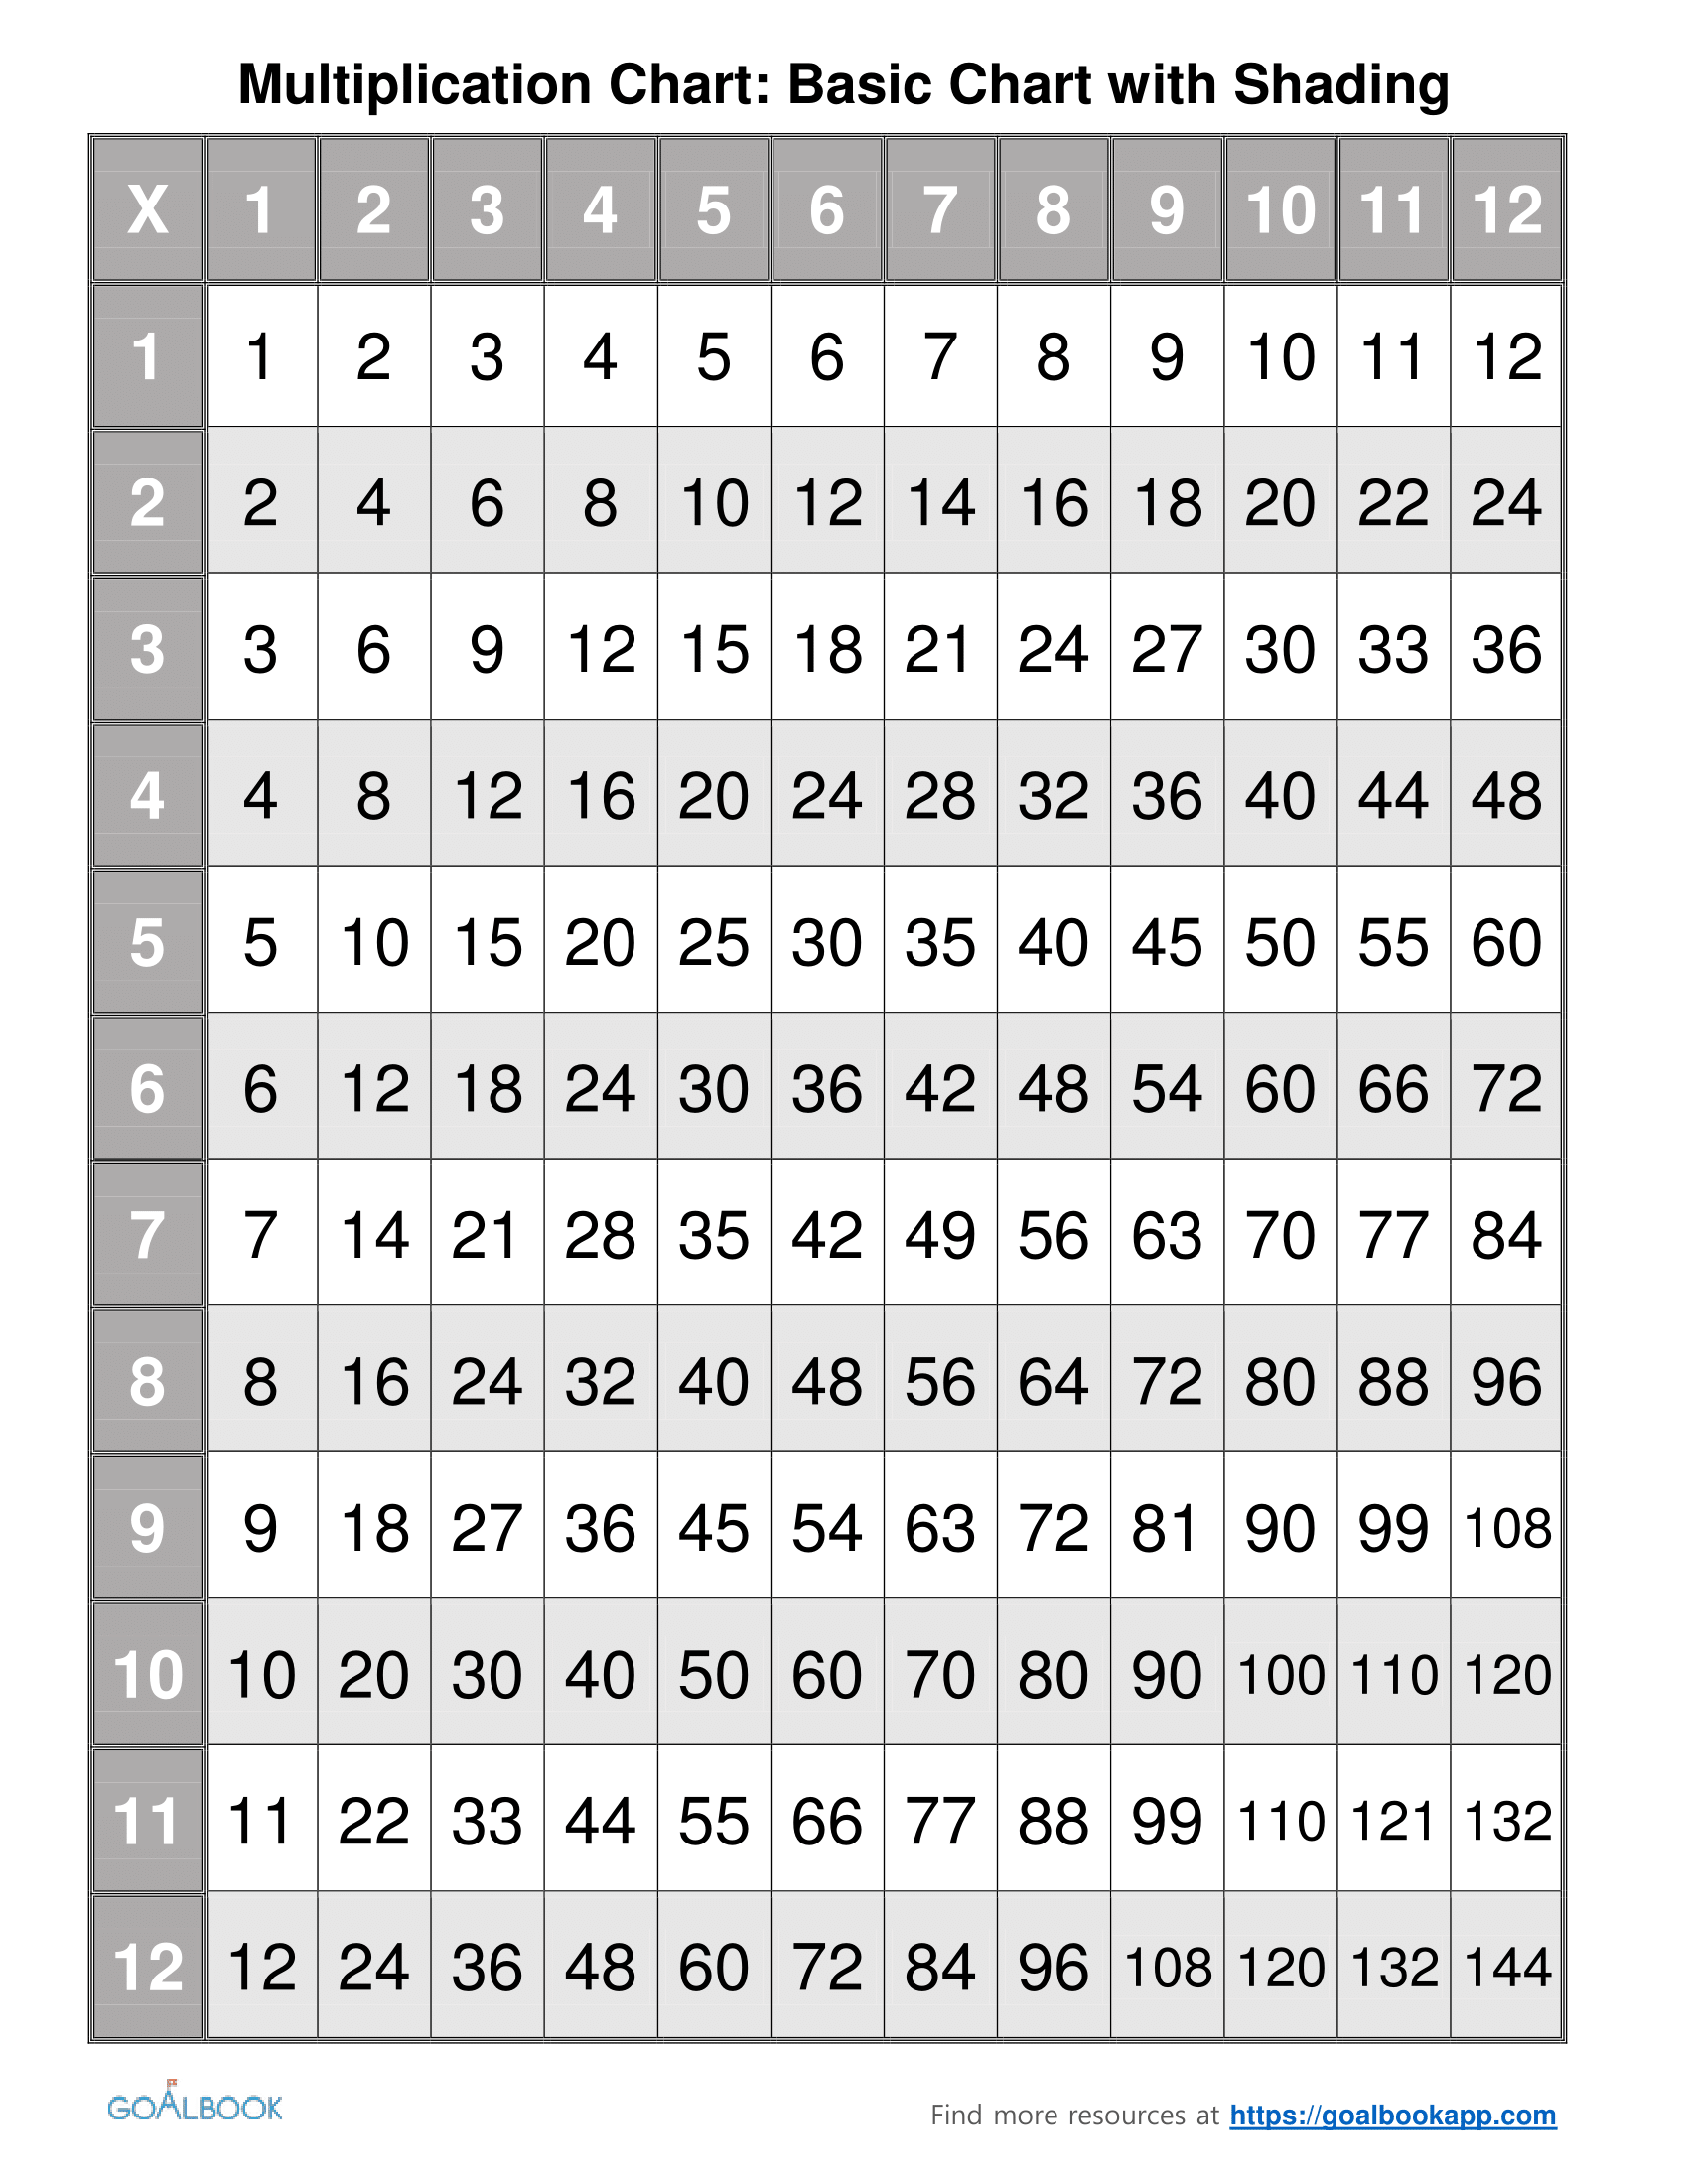 9 9 Multiplication Table Python